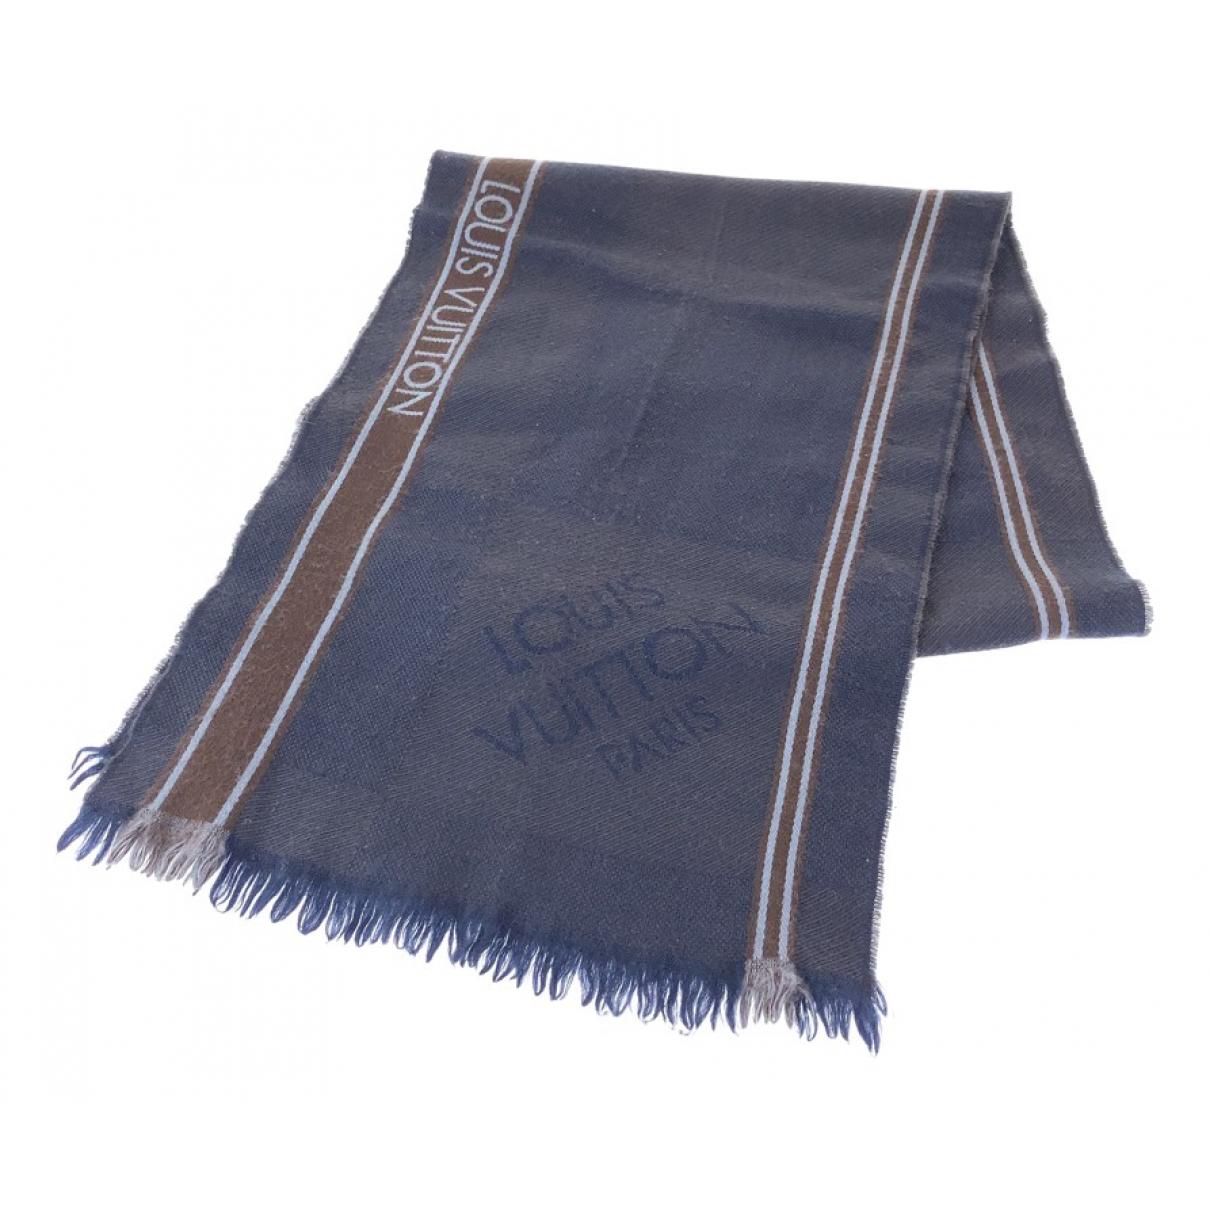 Pañuelo / bufanda de Lana Louis Vuitton